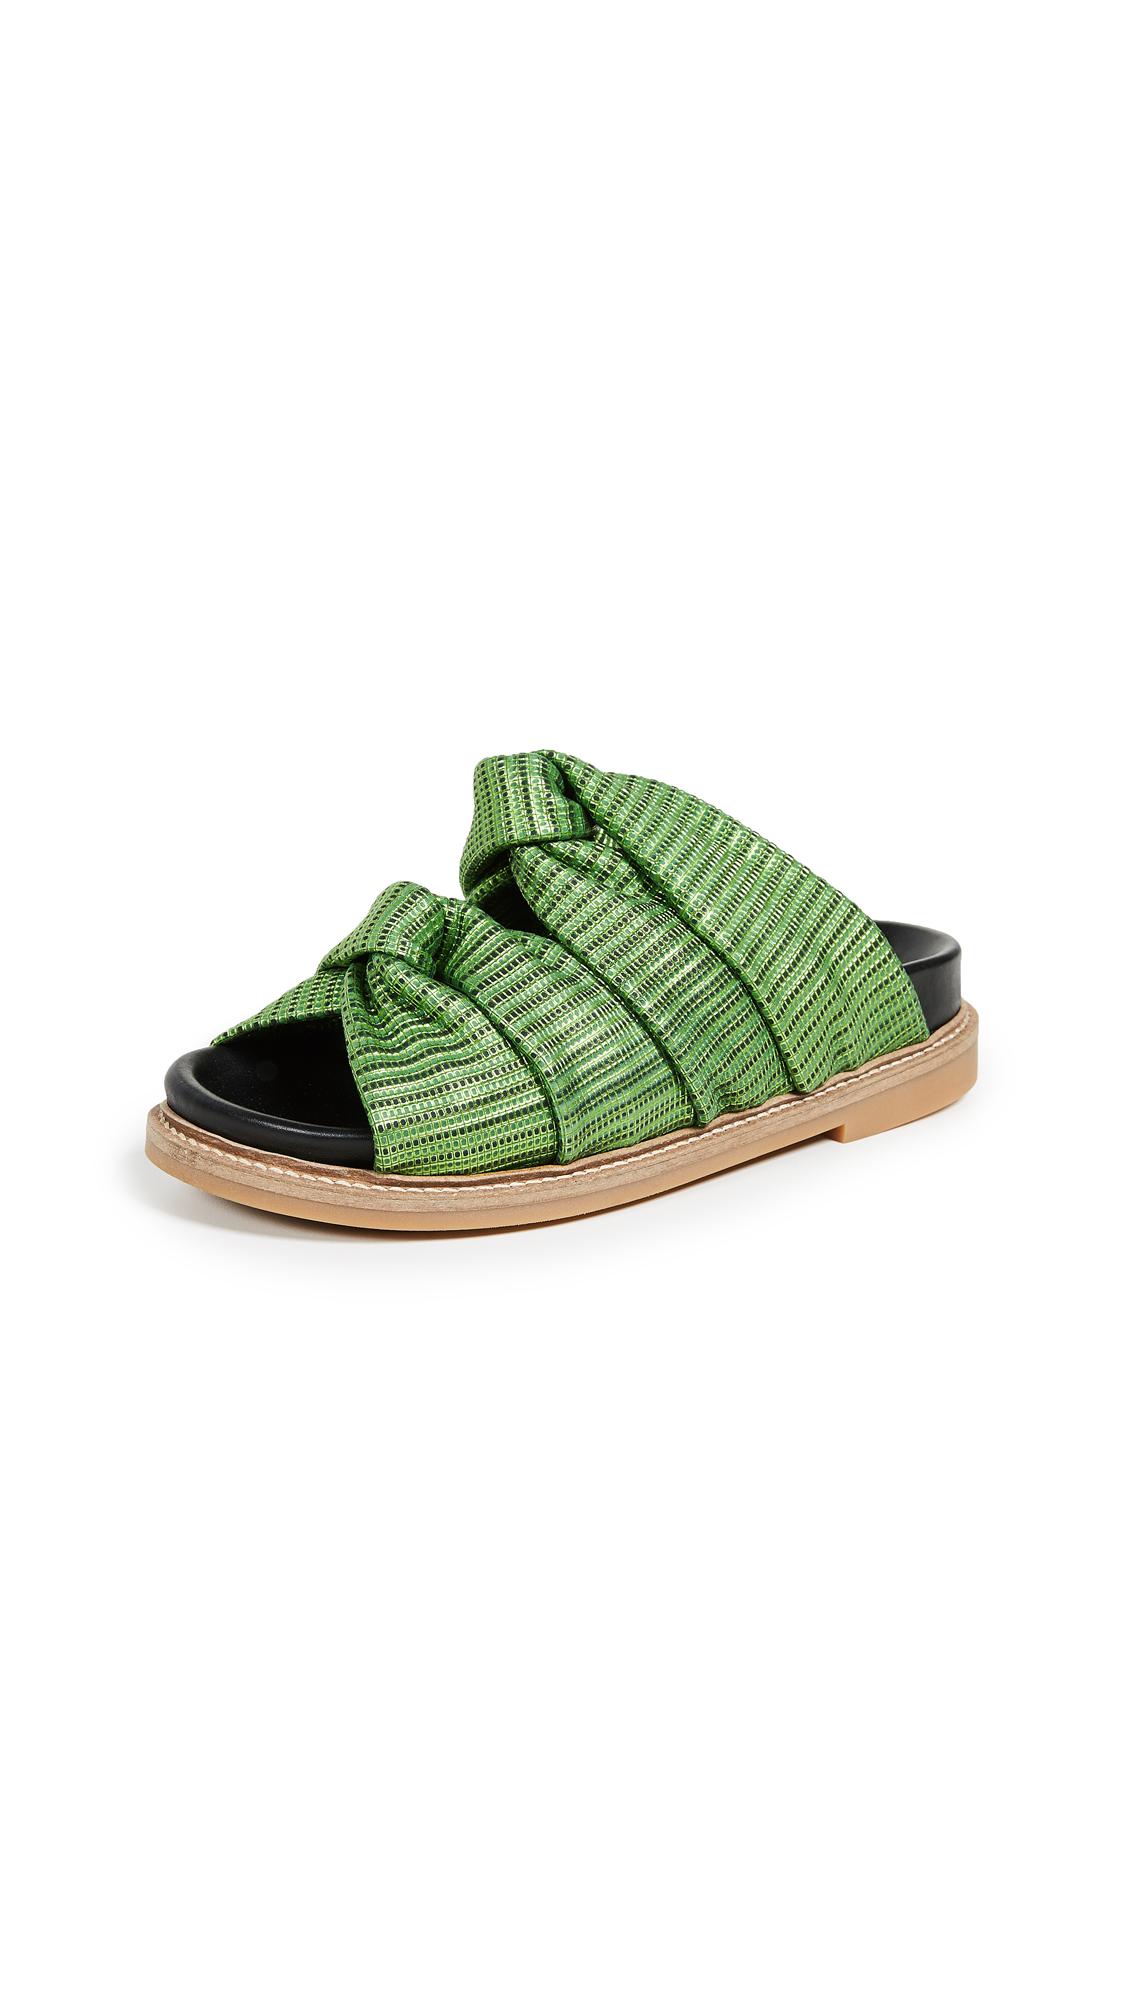 Anoush Slides, Classic Green